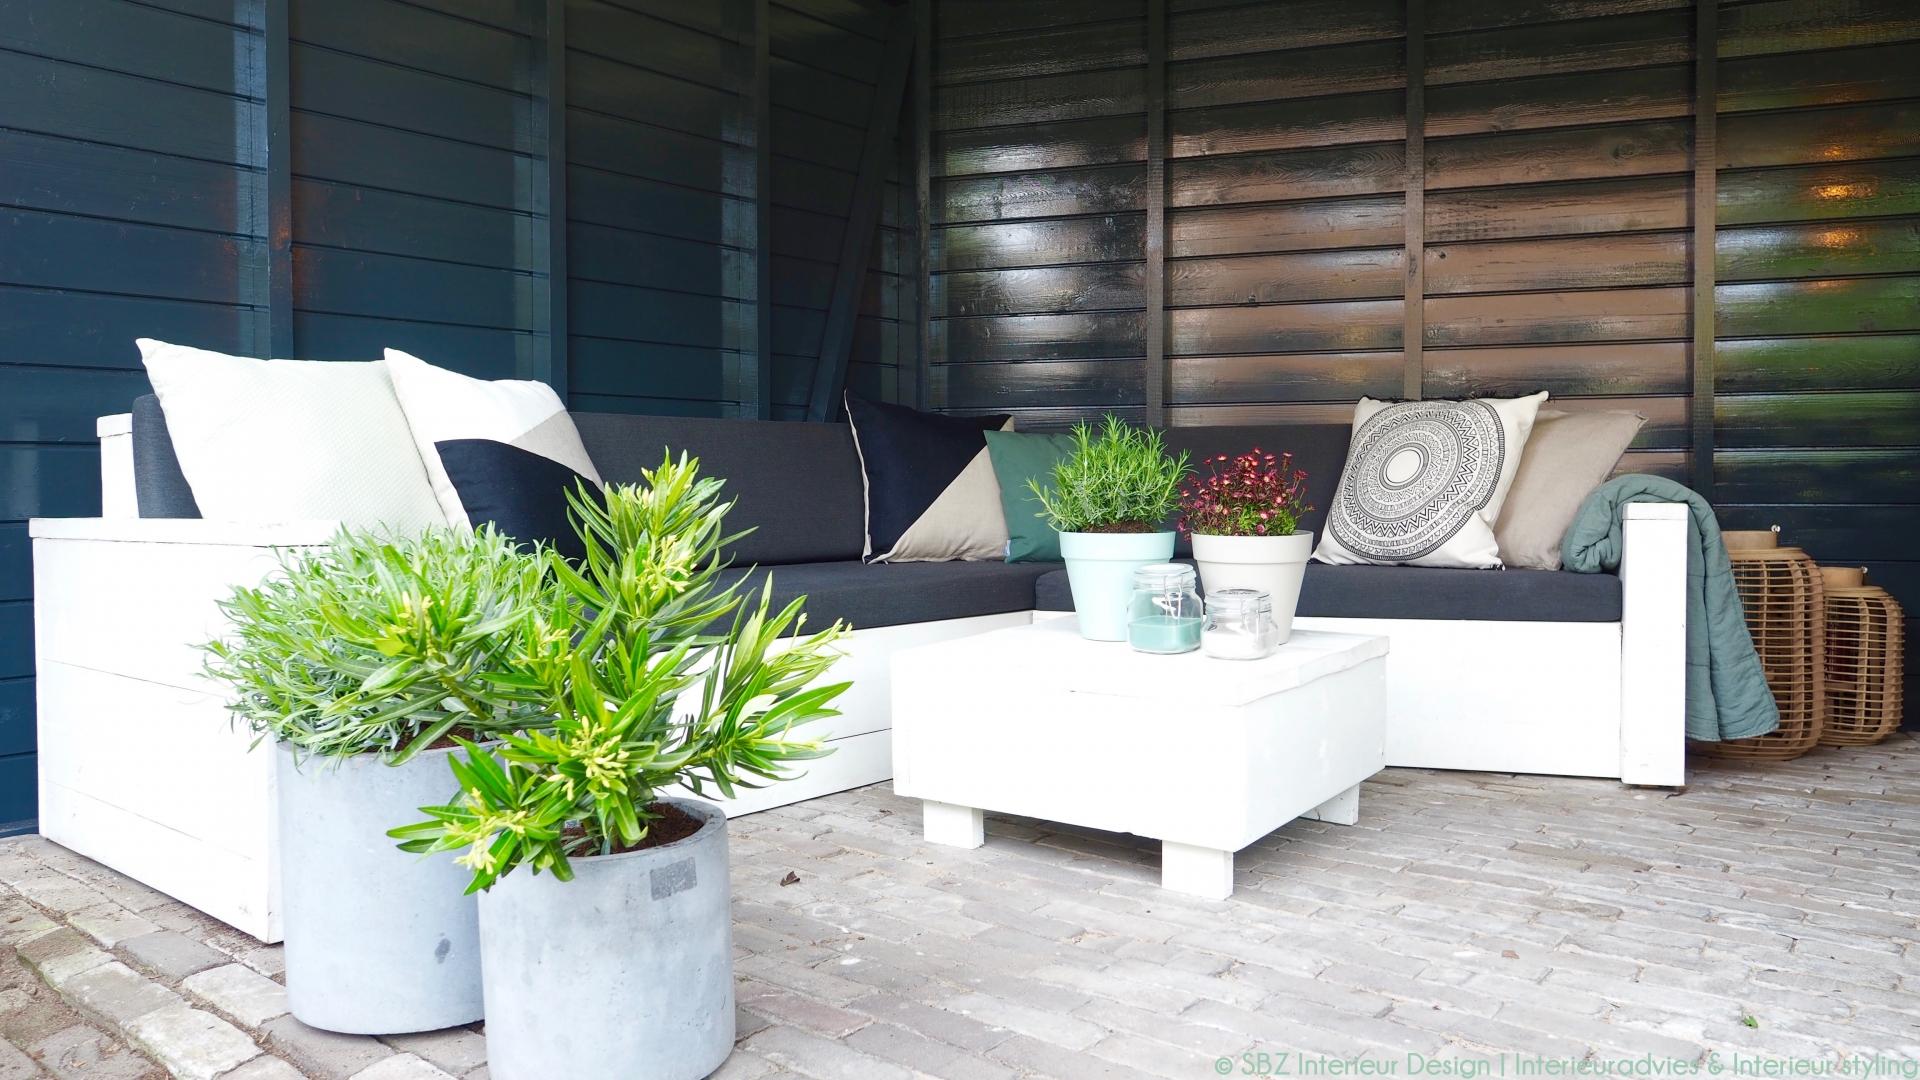 Tuin veranda styling te noord brabant sbz interieur design interieuradvies ontwerp - Tuin interieur design ...